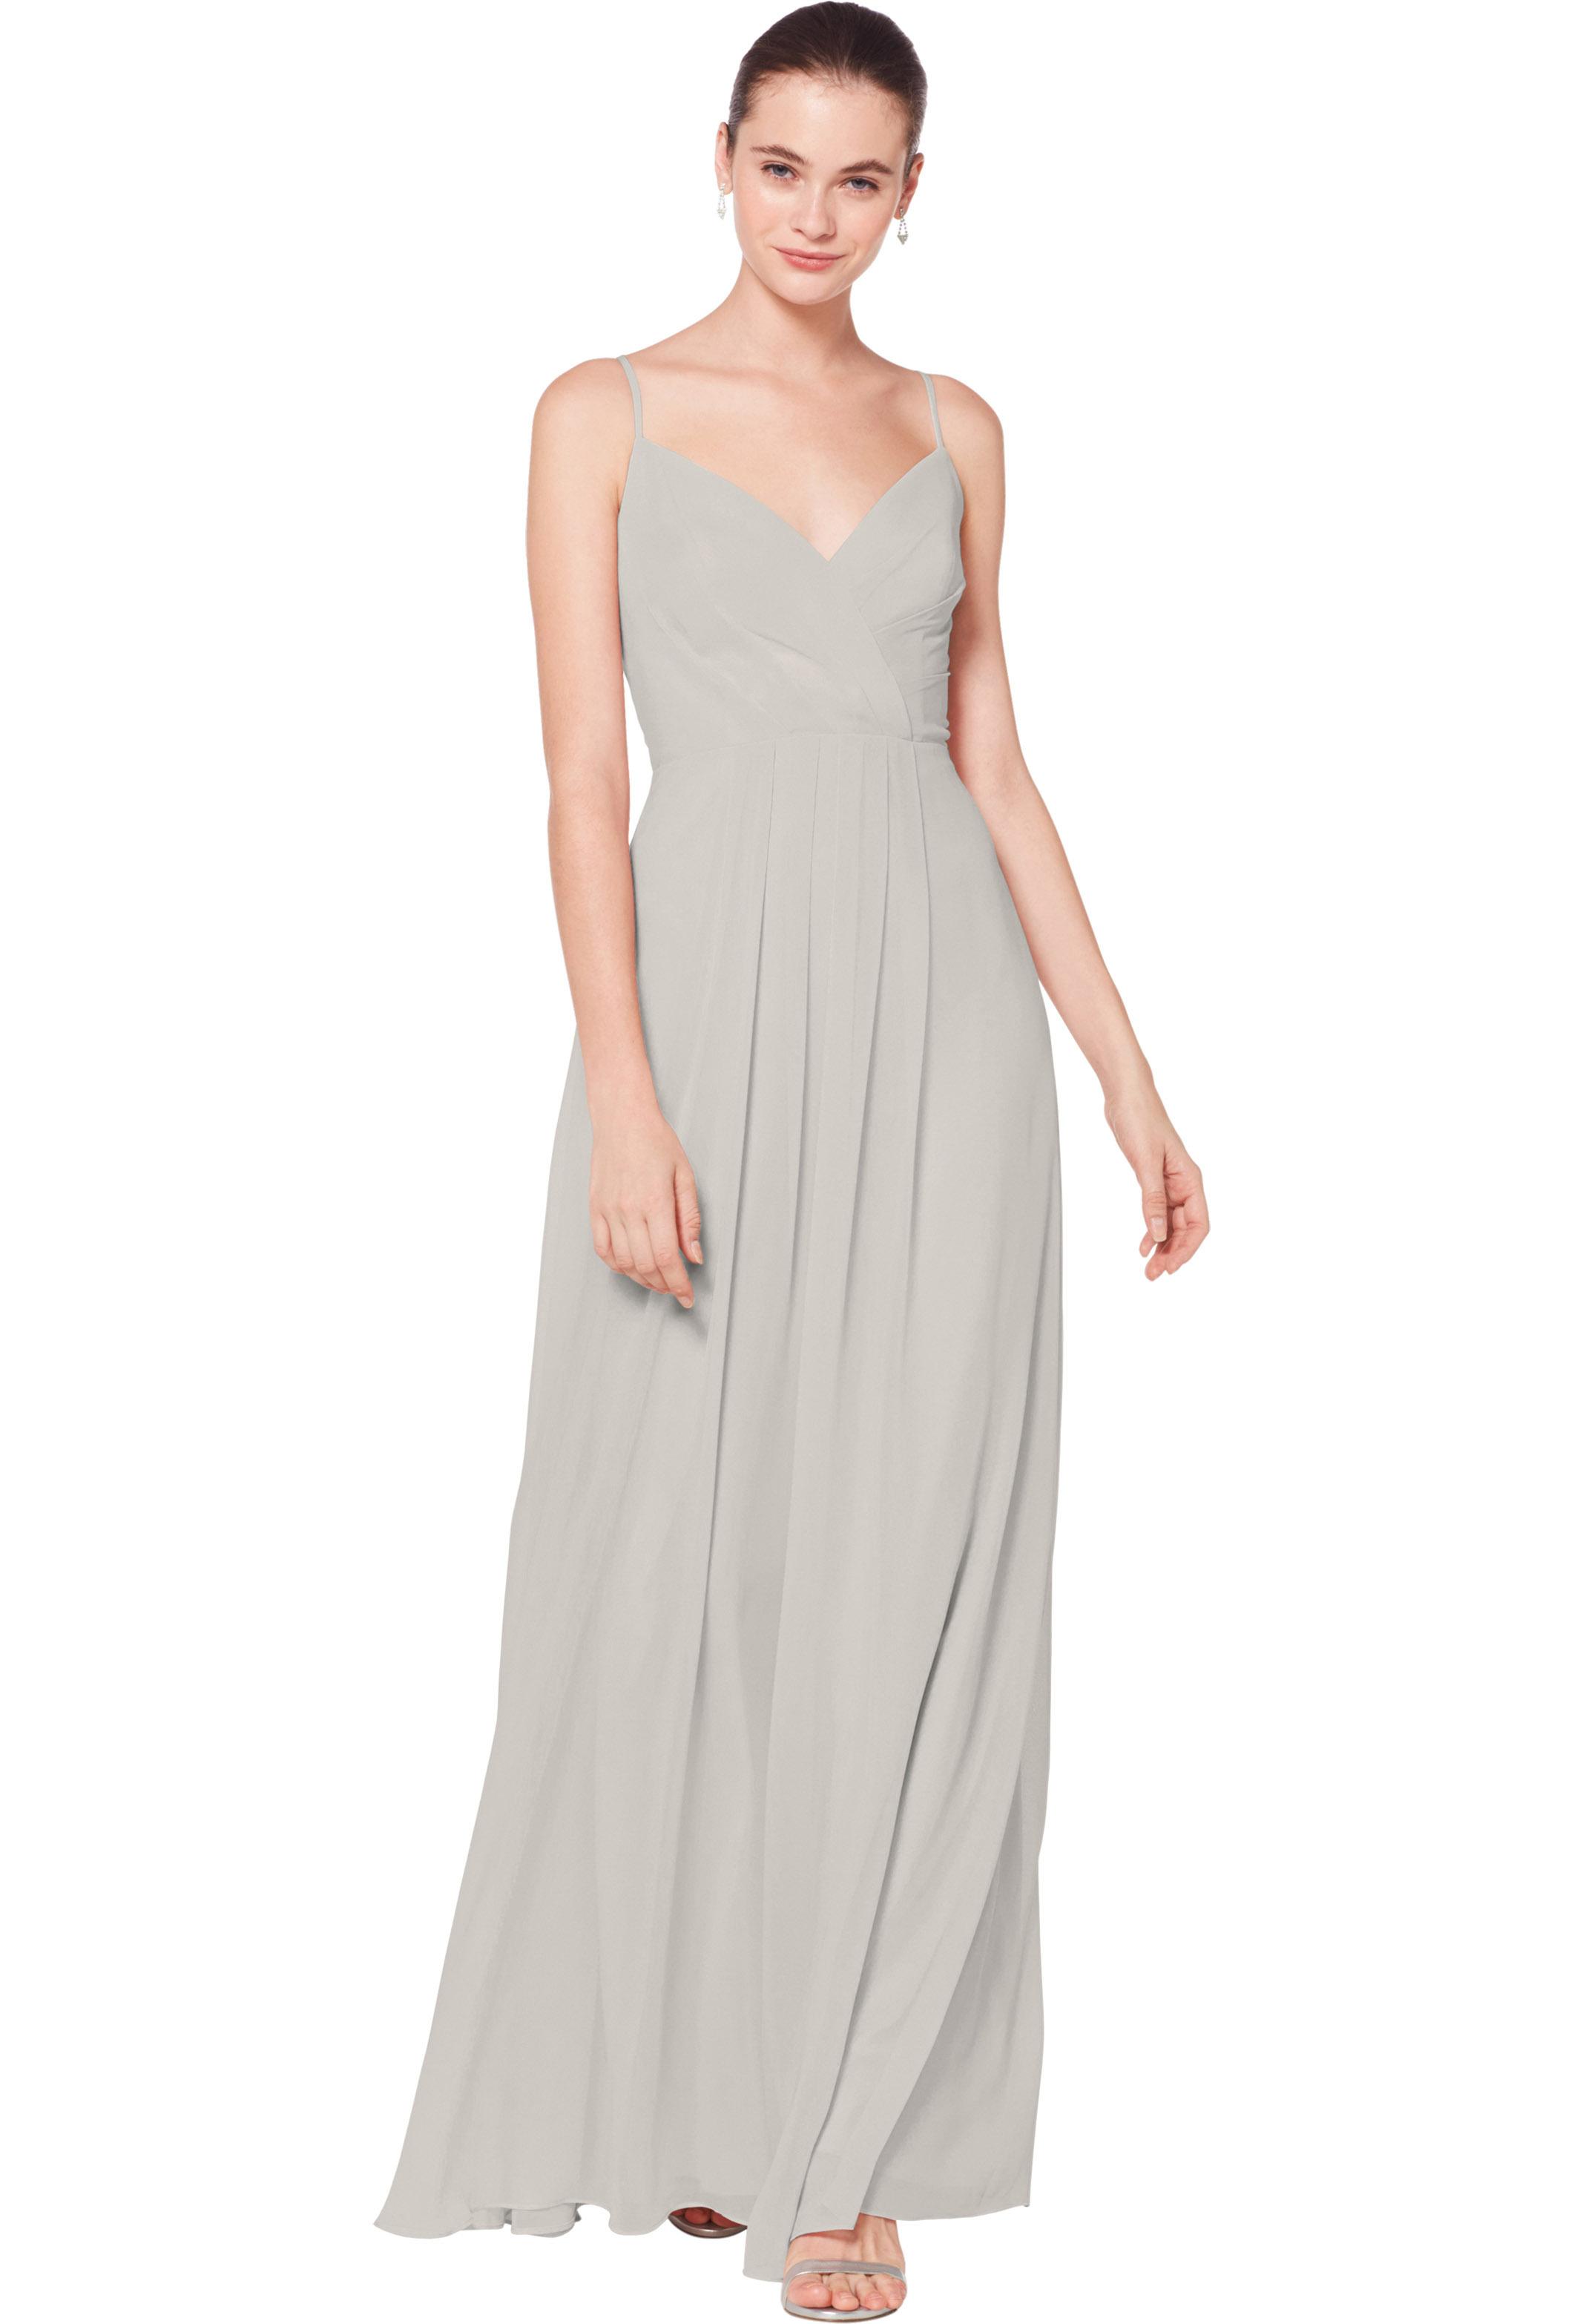 Bill Levkoff DESERT GREY Chiffon Sweetheart A-line gown, $178.00 Front